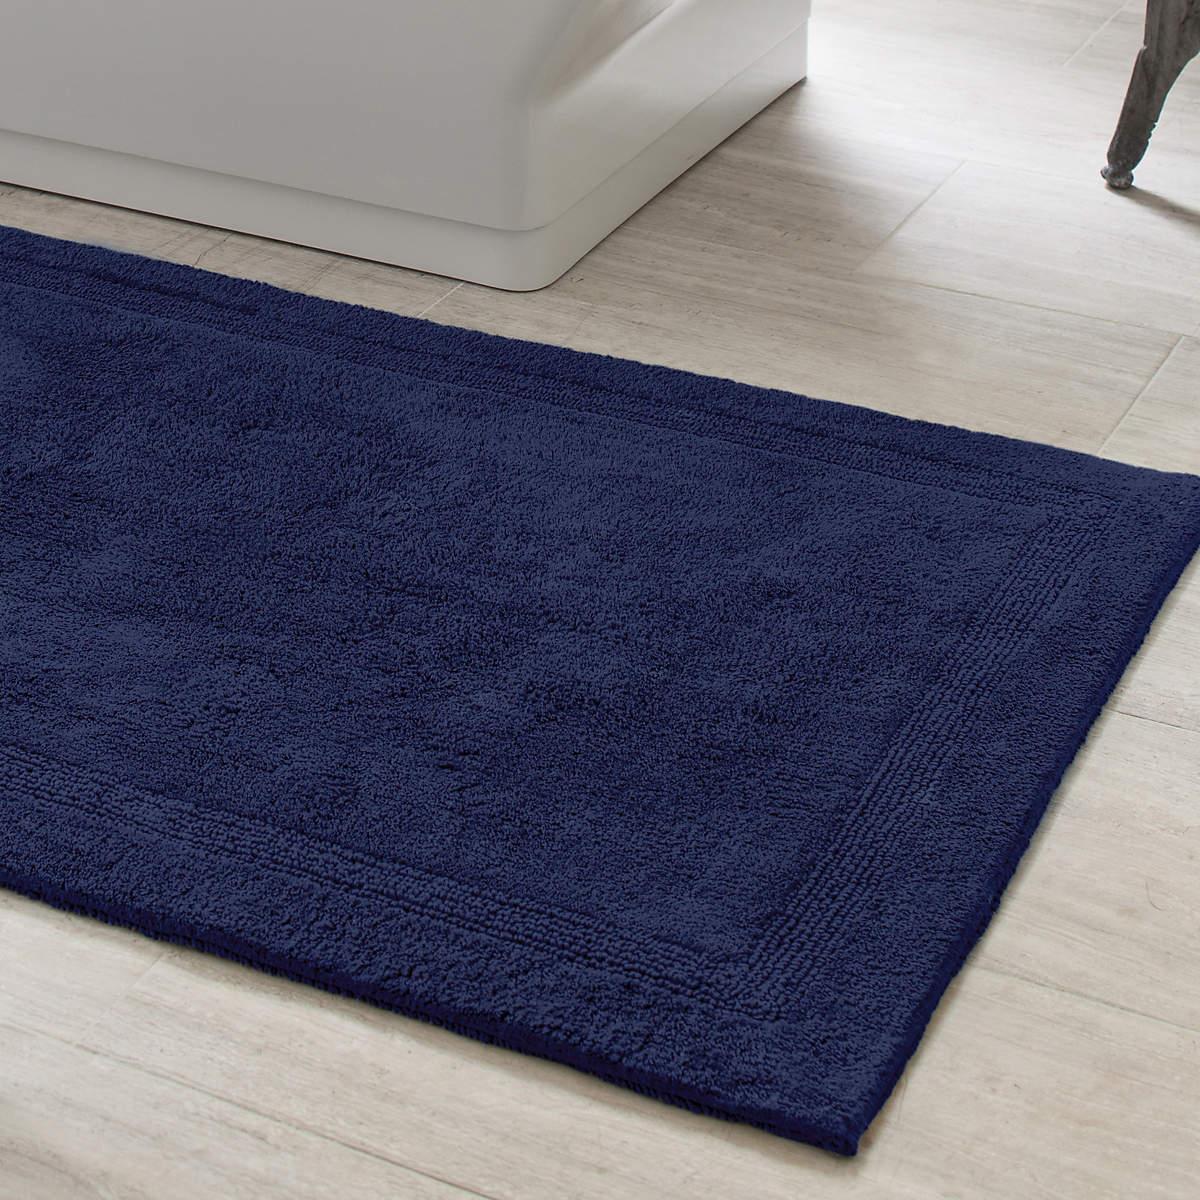 bathroom rug signature indigo bath rug | pine cone hill MLSVCGJ